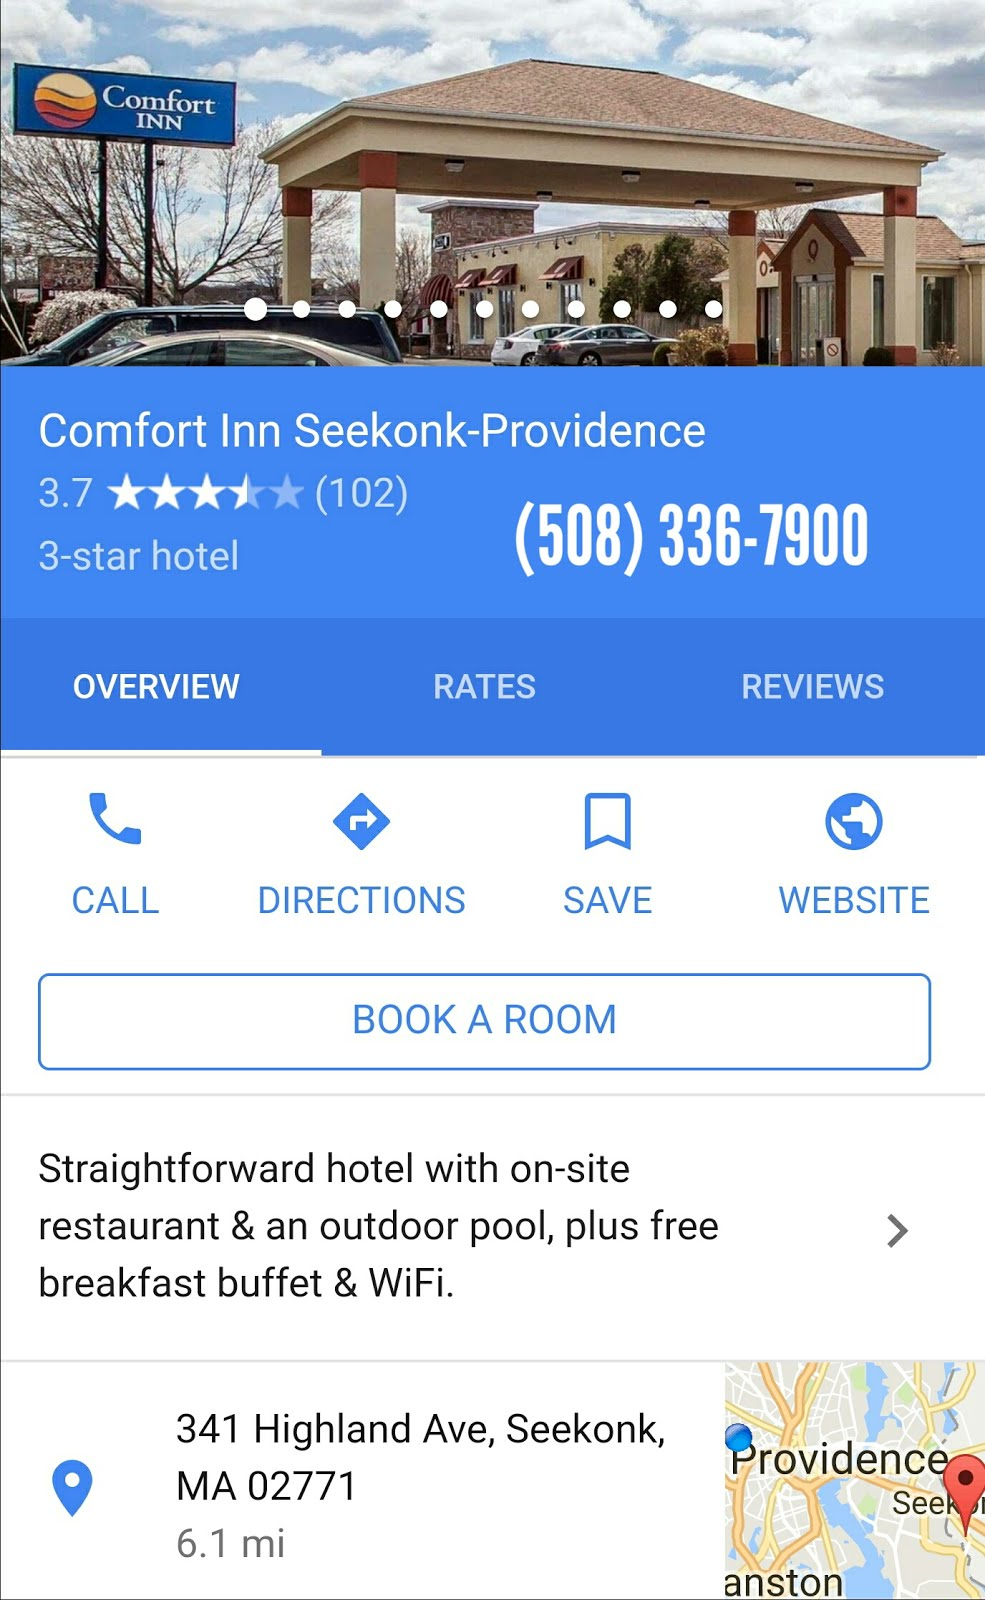 Comfort Inn Seekonk-Providence